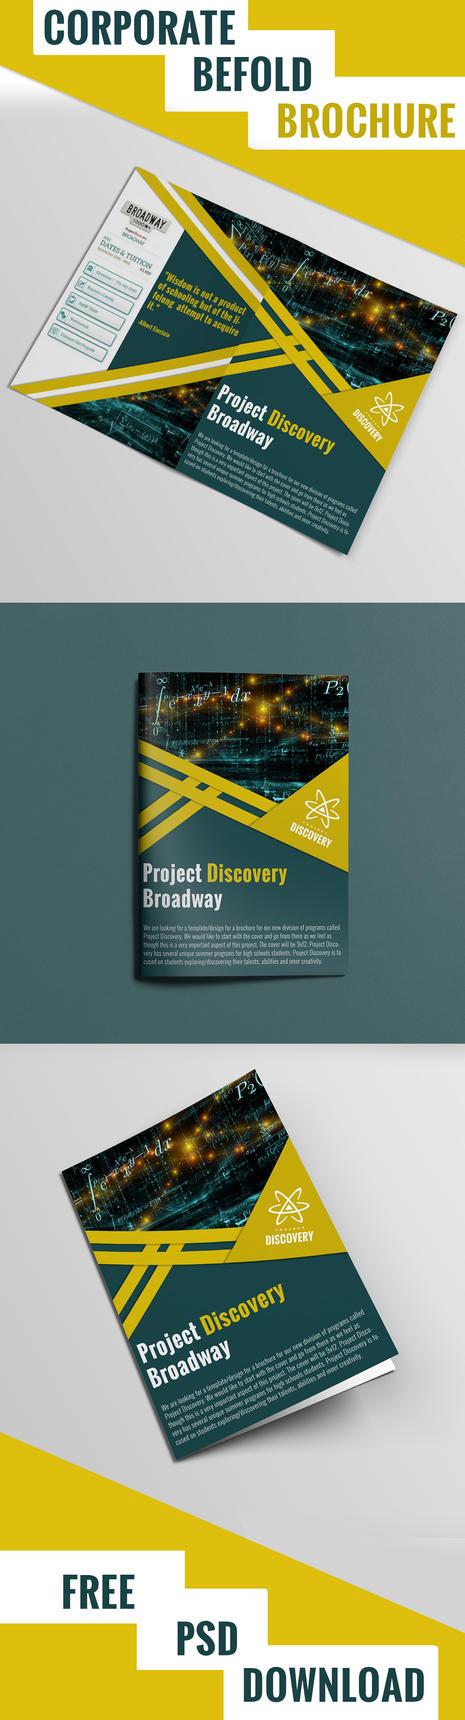 Corporate Brochure free psd by sunnygoldeneye